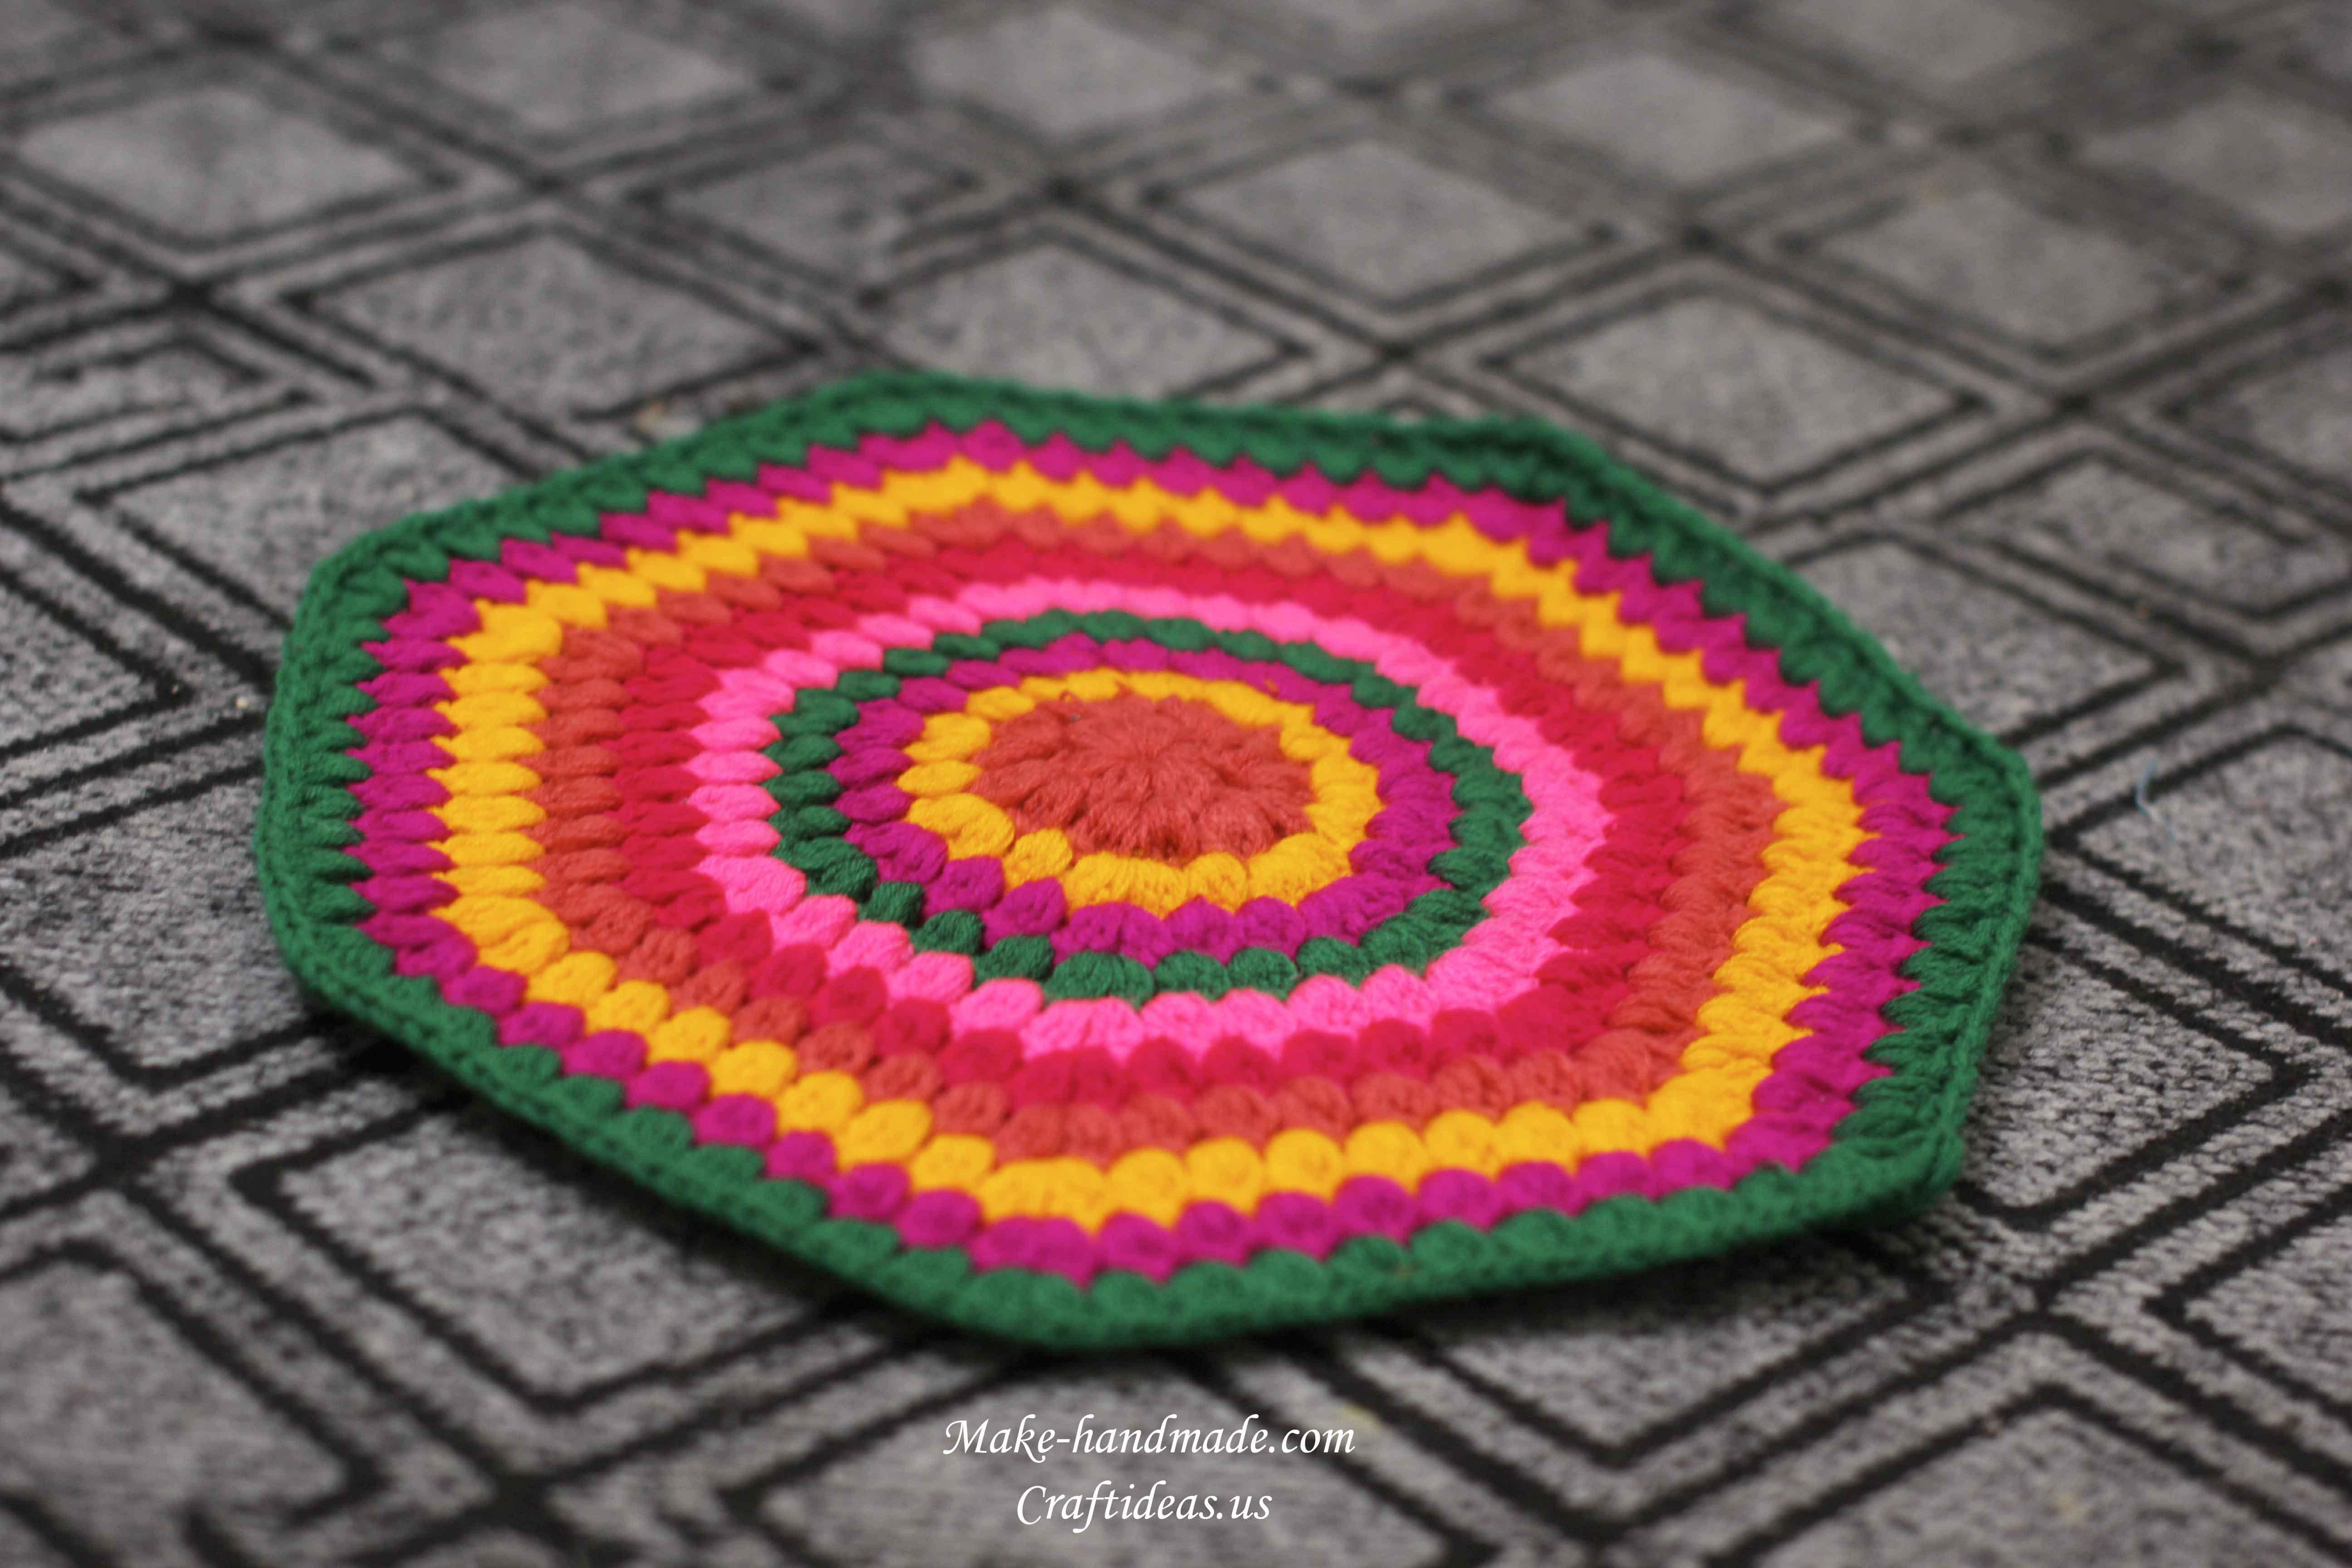 crochet colorful handmade rug ideas